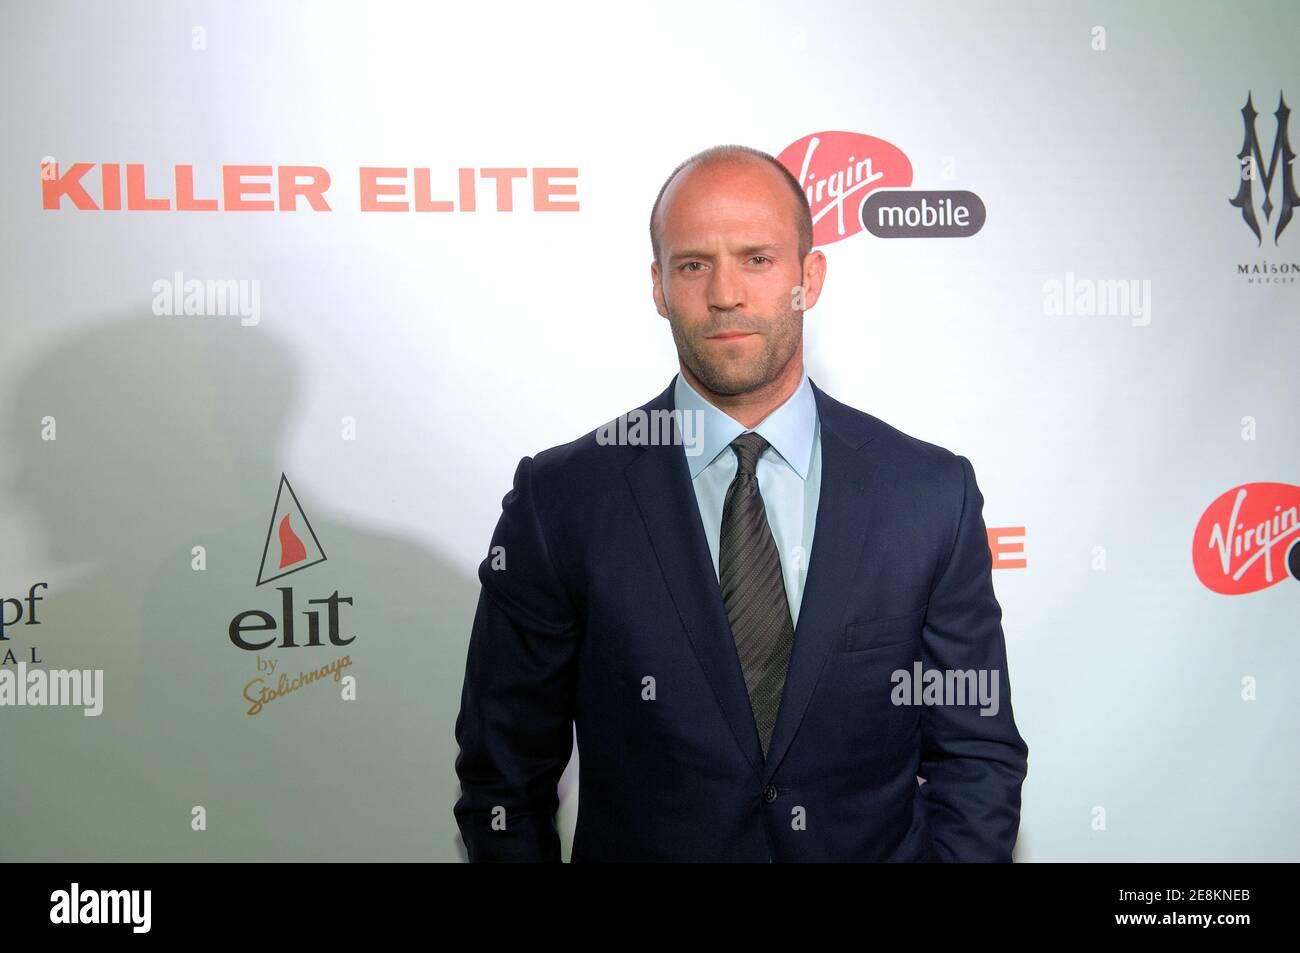 "Toronto, Kanada - 10. September 2011: Jason Statham kommt nach der Filmpremiere beim Toronto International Film Festival am 2011. September in Toronto, Ontario, zum ""Killer Elite""-Empfang. Stockfoto"